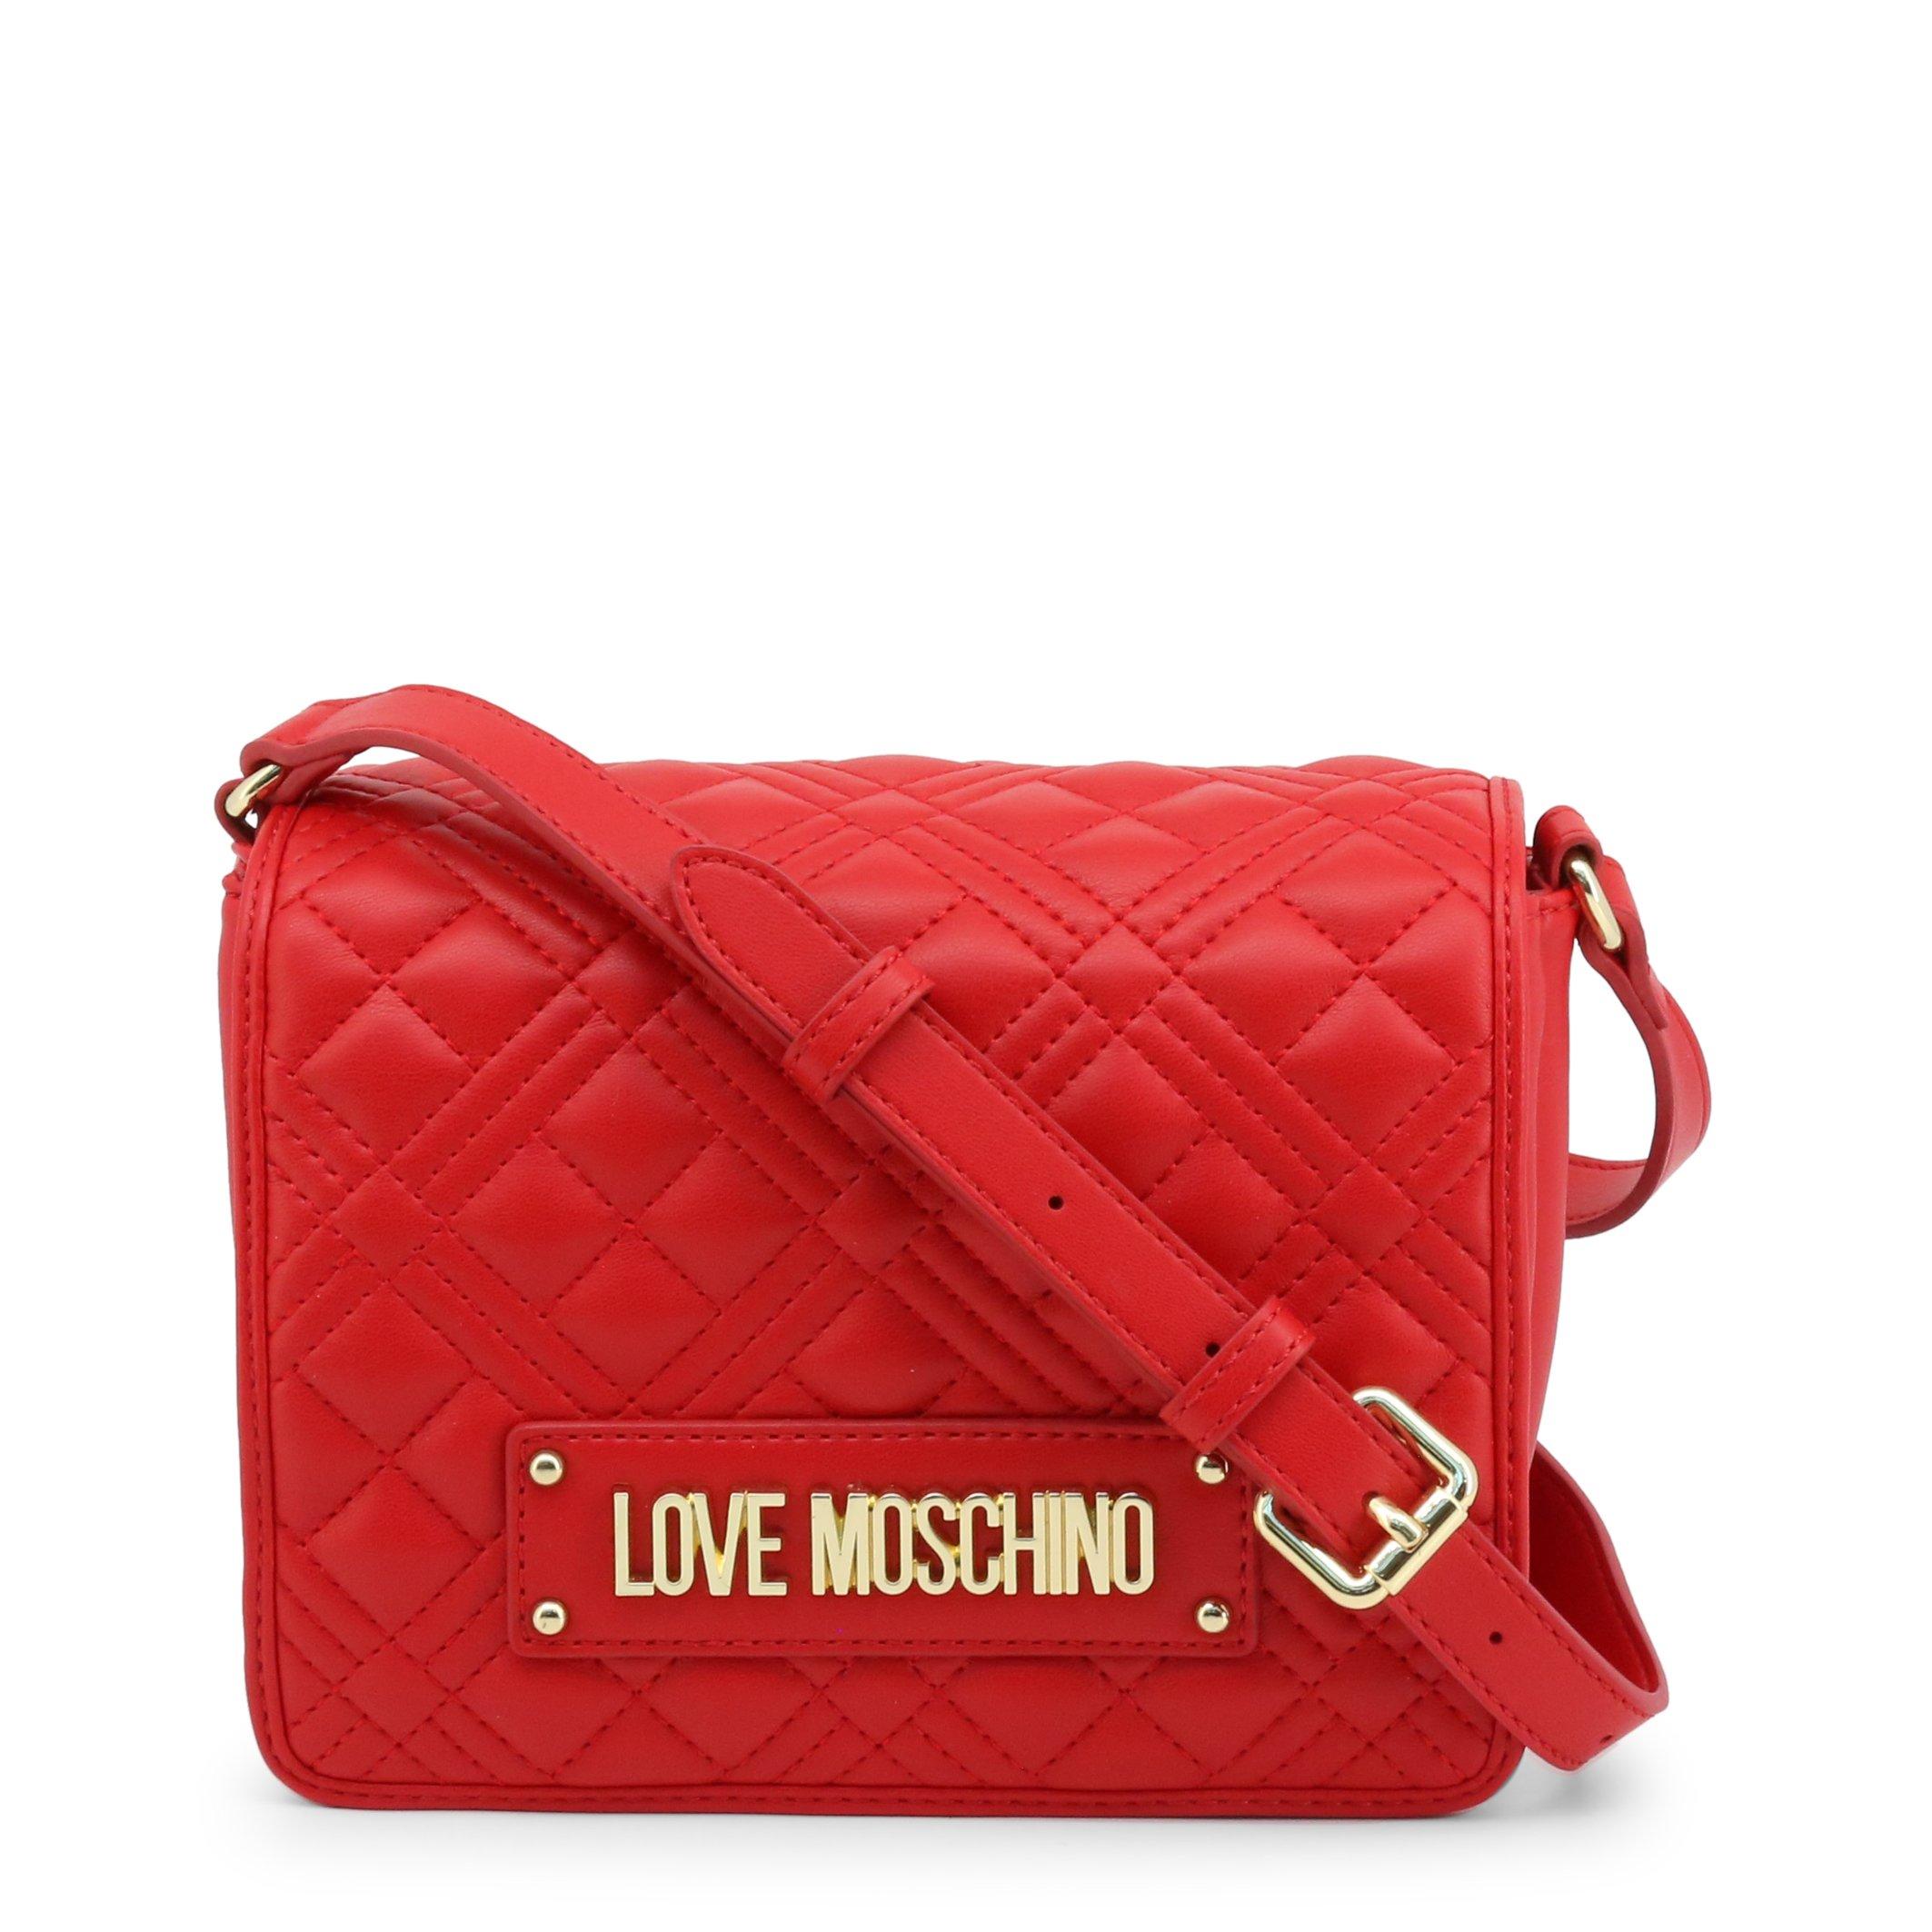 Love Moschino Women's Crossbody Bag Various Colours JC4002PP1CLA0 - red NOSIZE